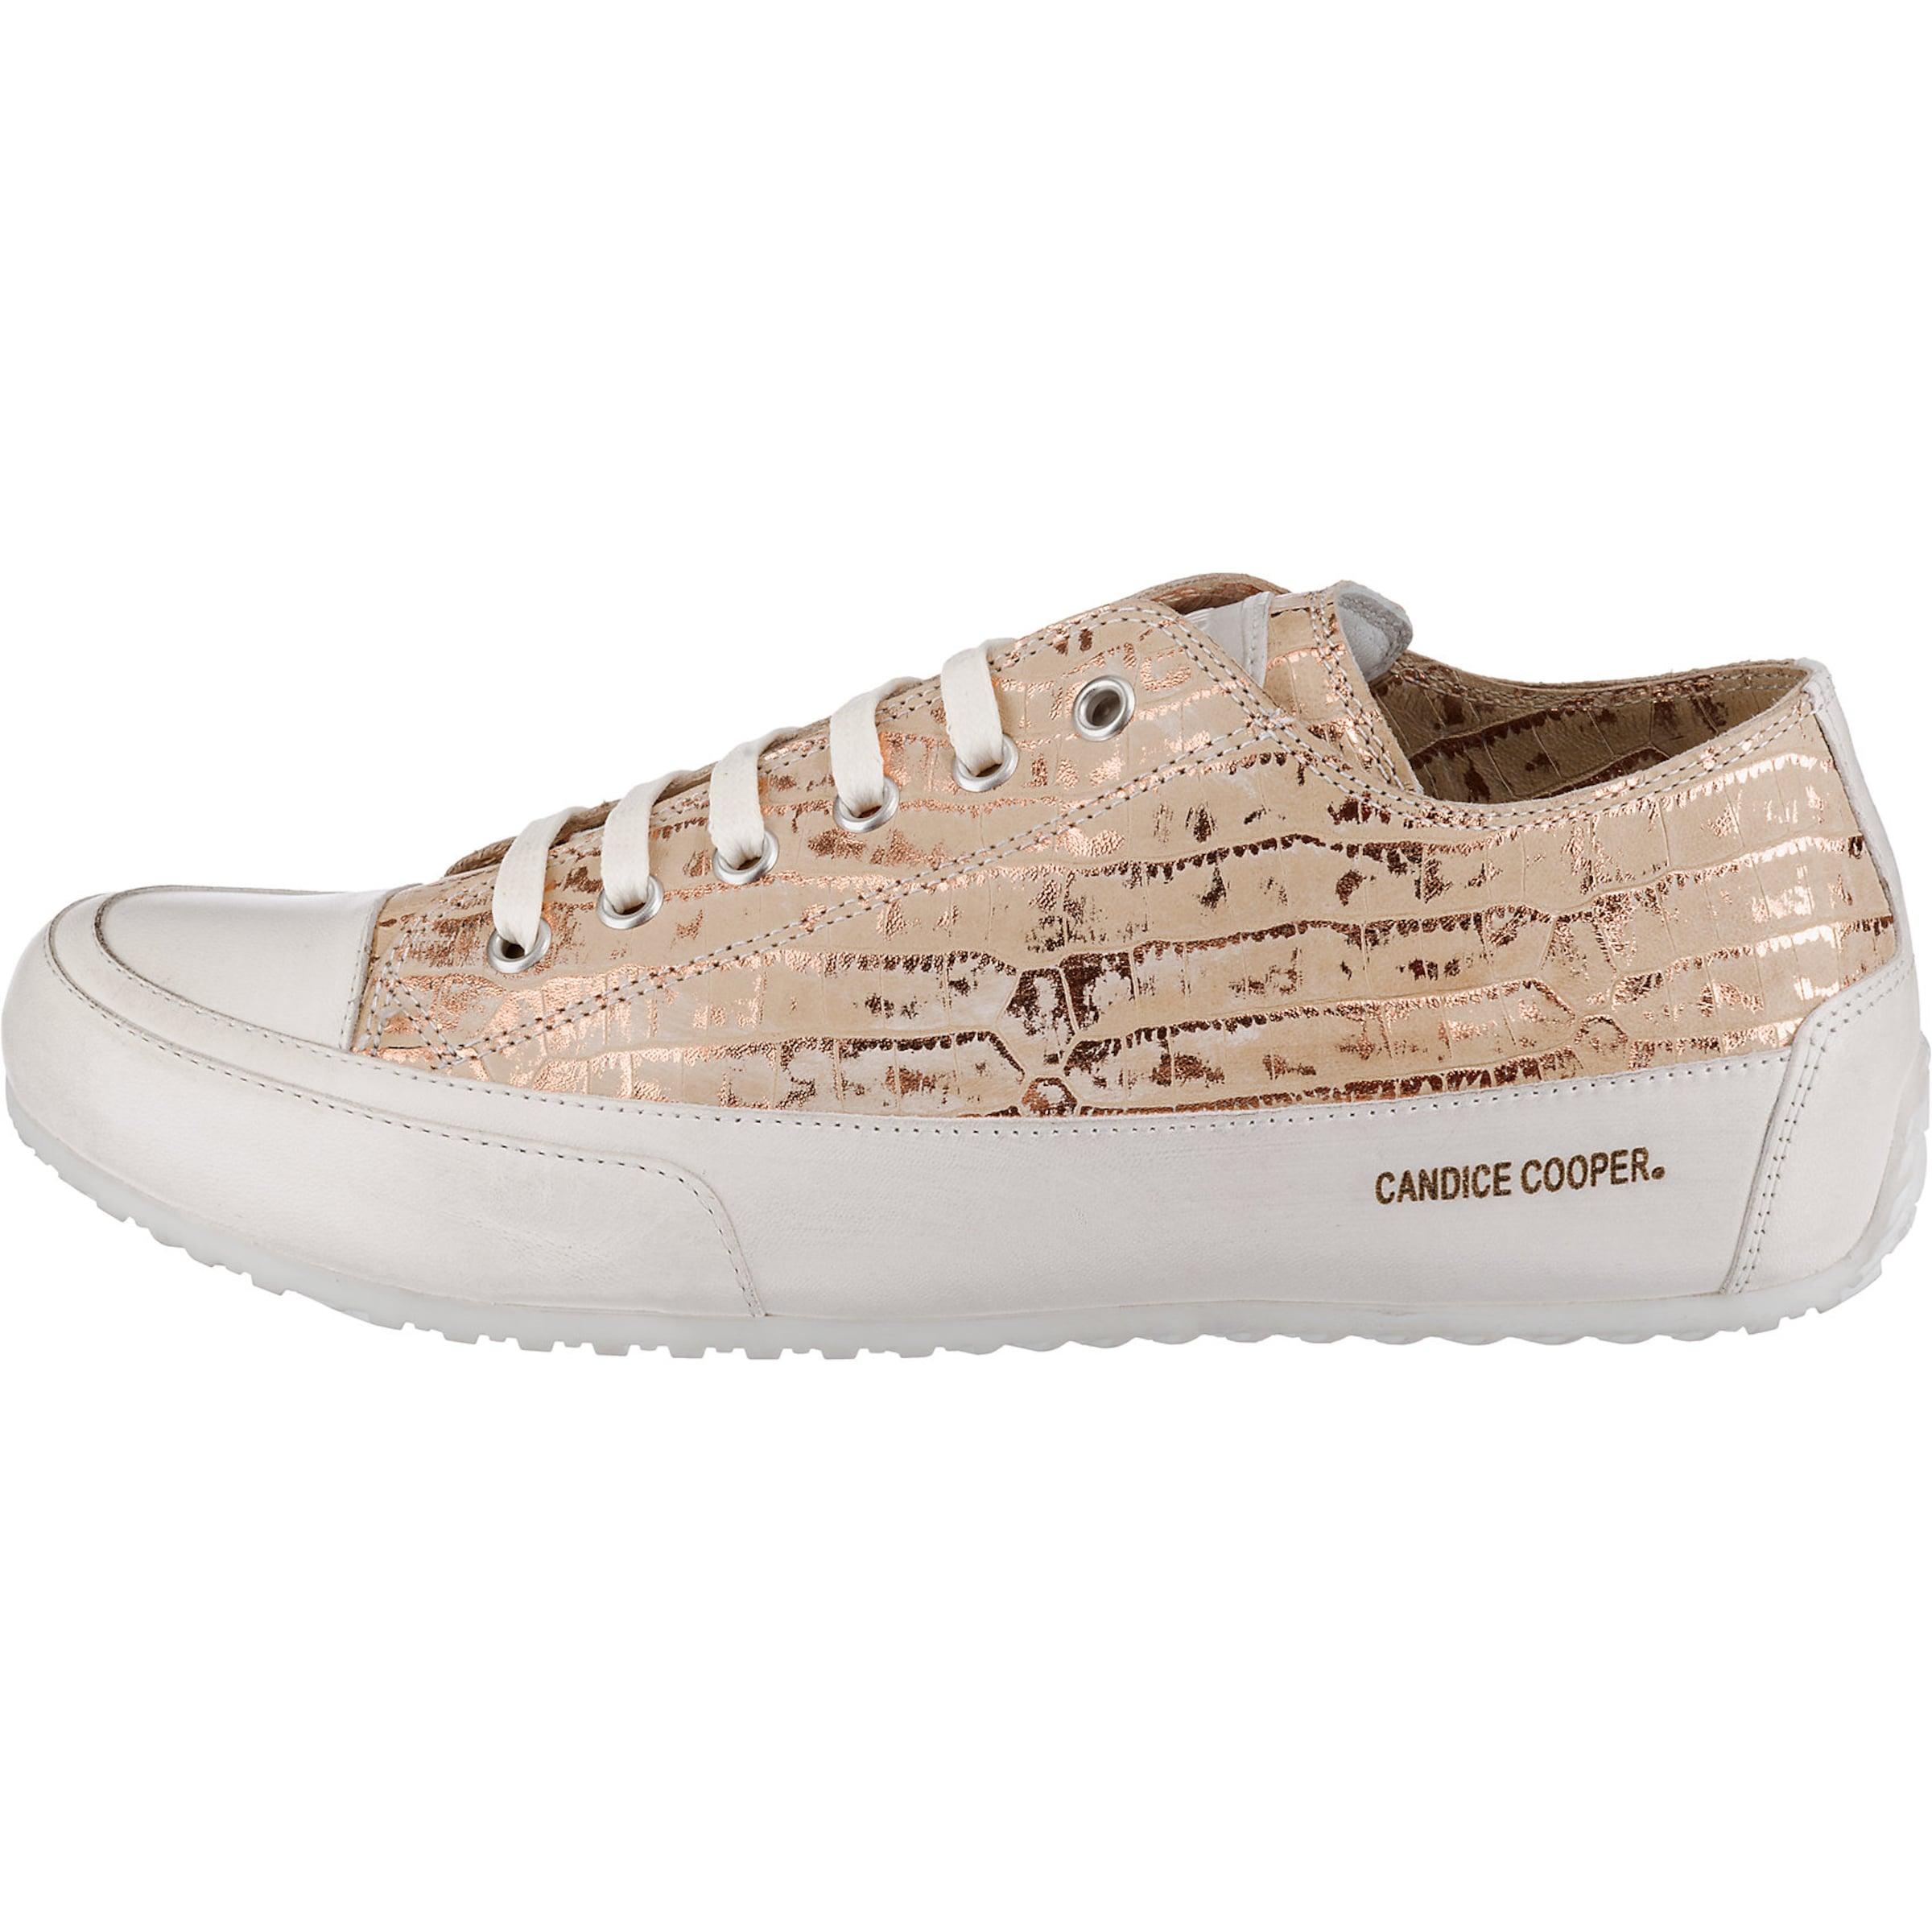 Candice Candice Cooper Sneakers GoldWeiß In Cooper HIE9D2